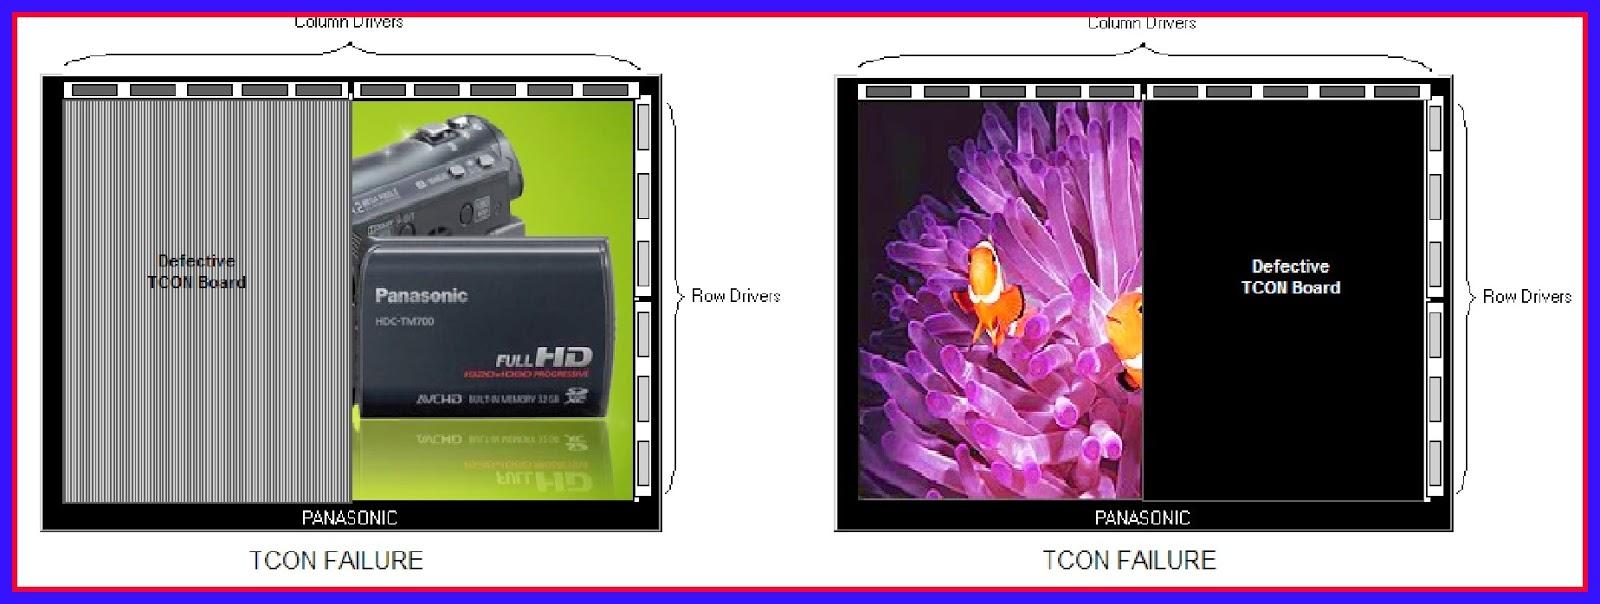 ELECTRONIC EQUIPMENT REPAIR CENTRE : LCD TV T-CON BOARD